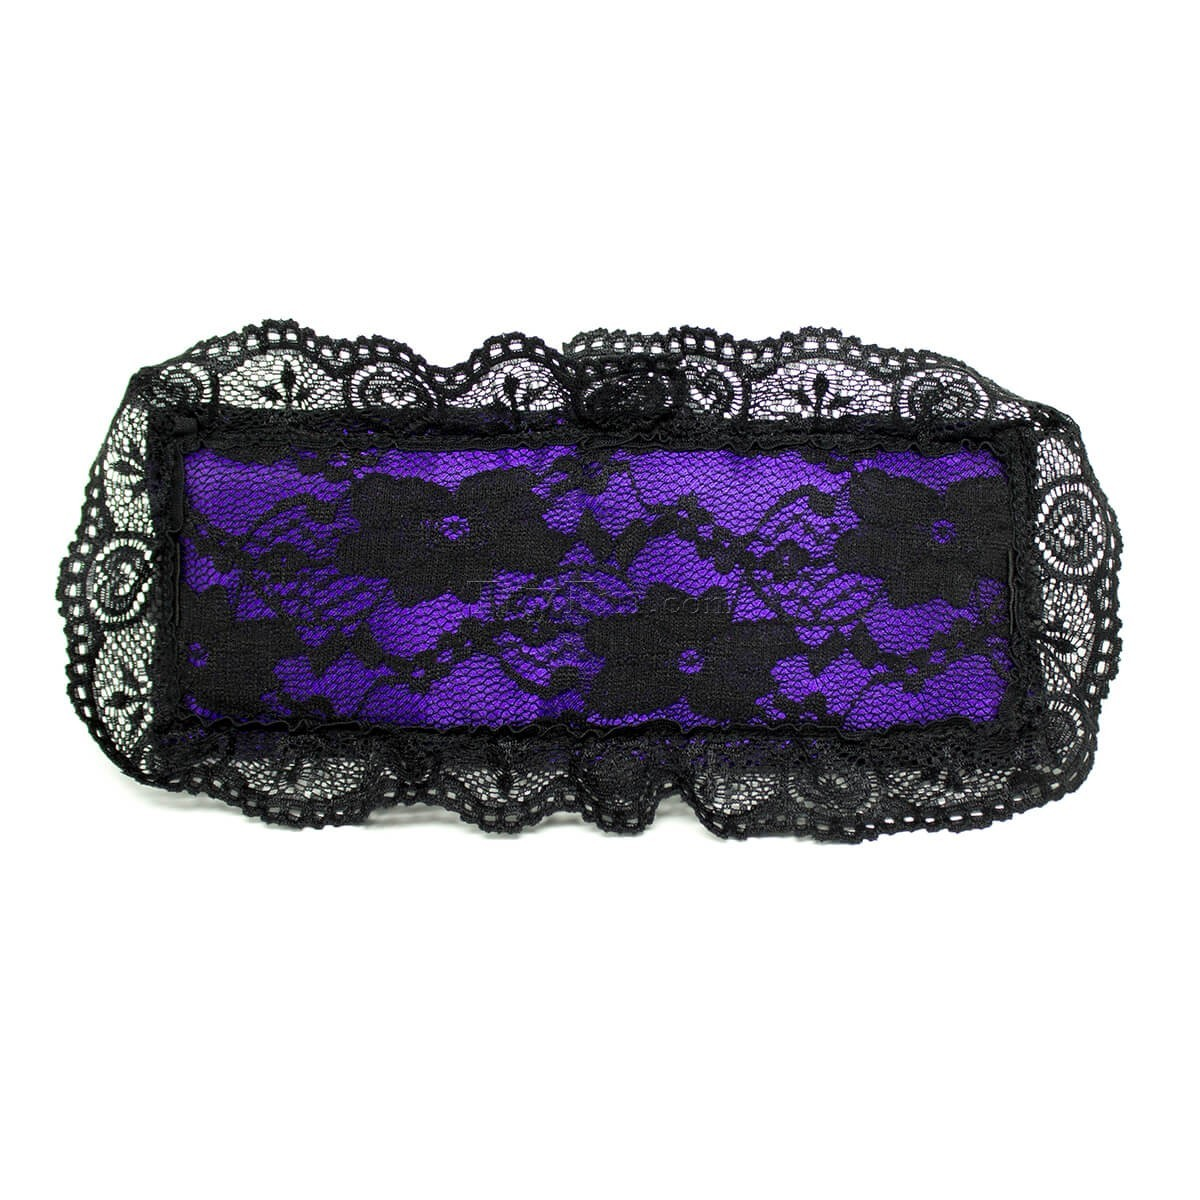 2-lace-blindfold-handcuffs-set-purple15.jpg